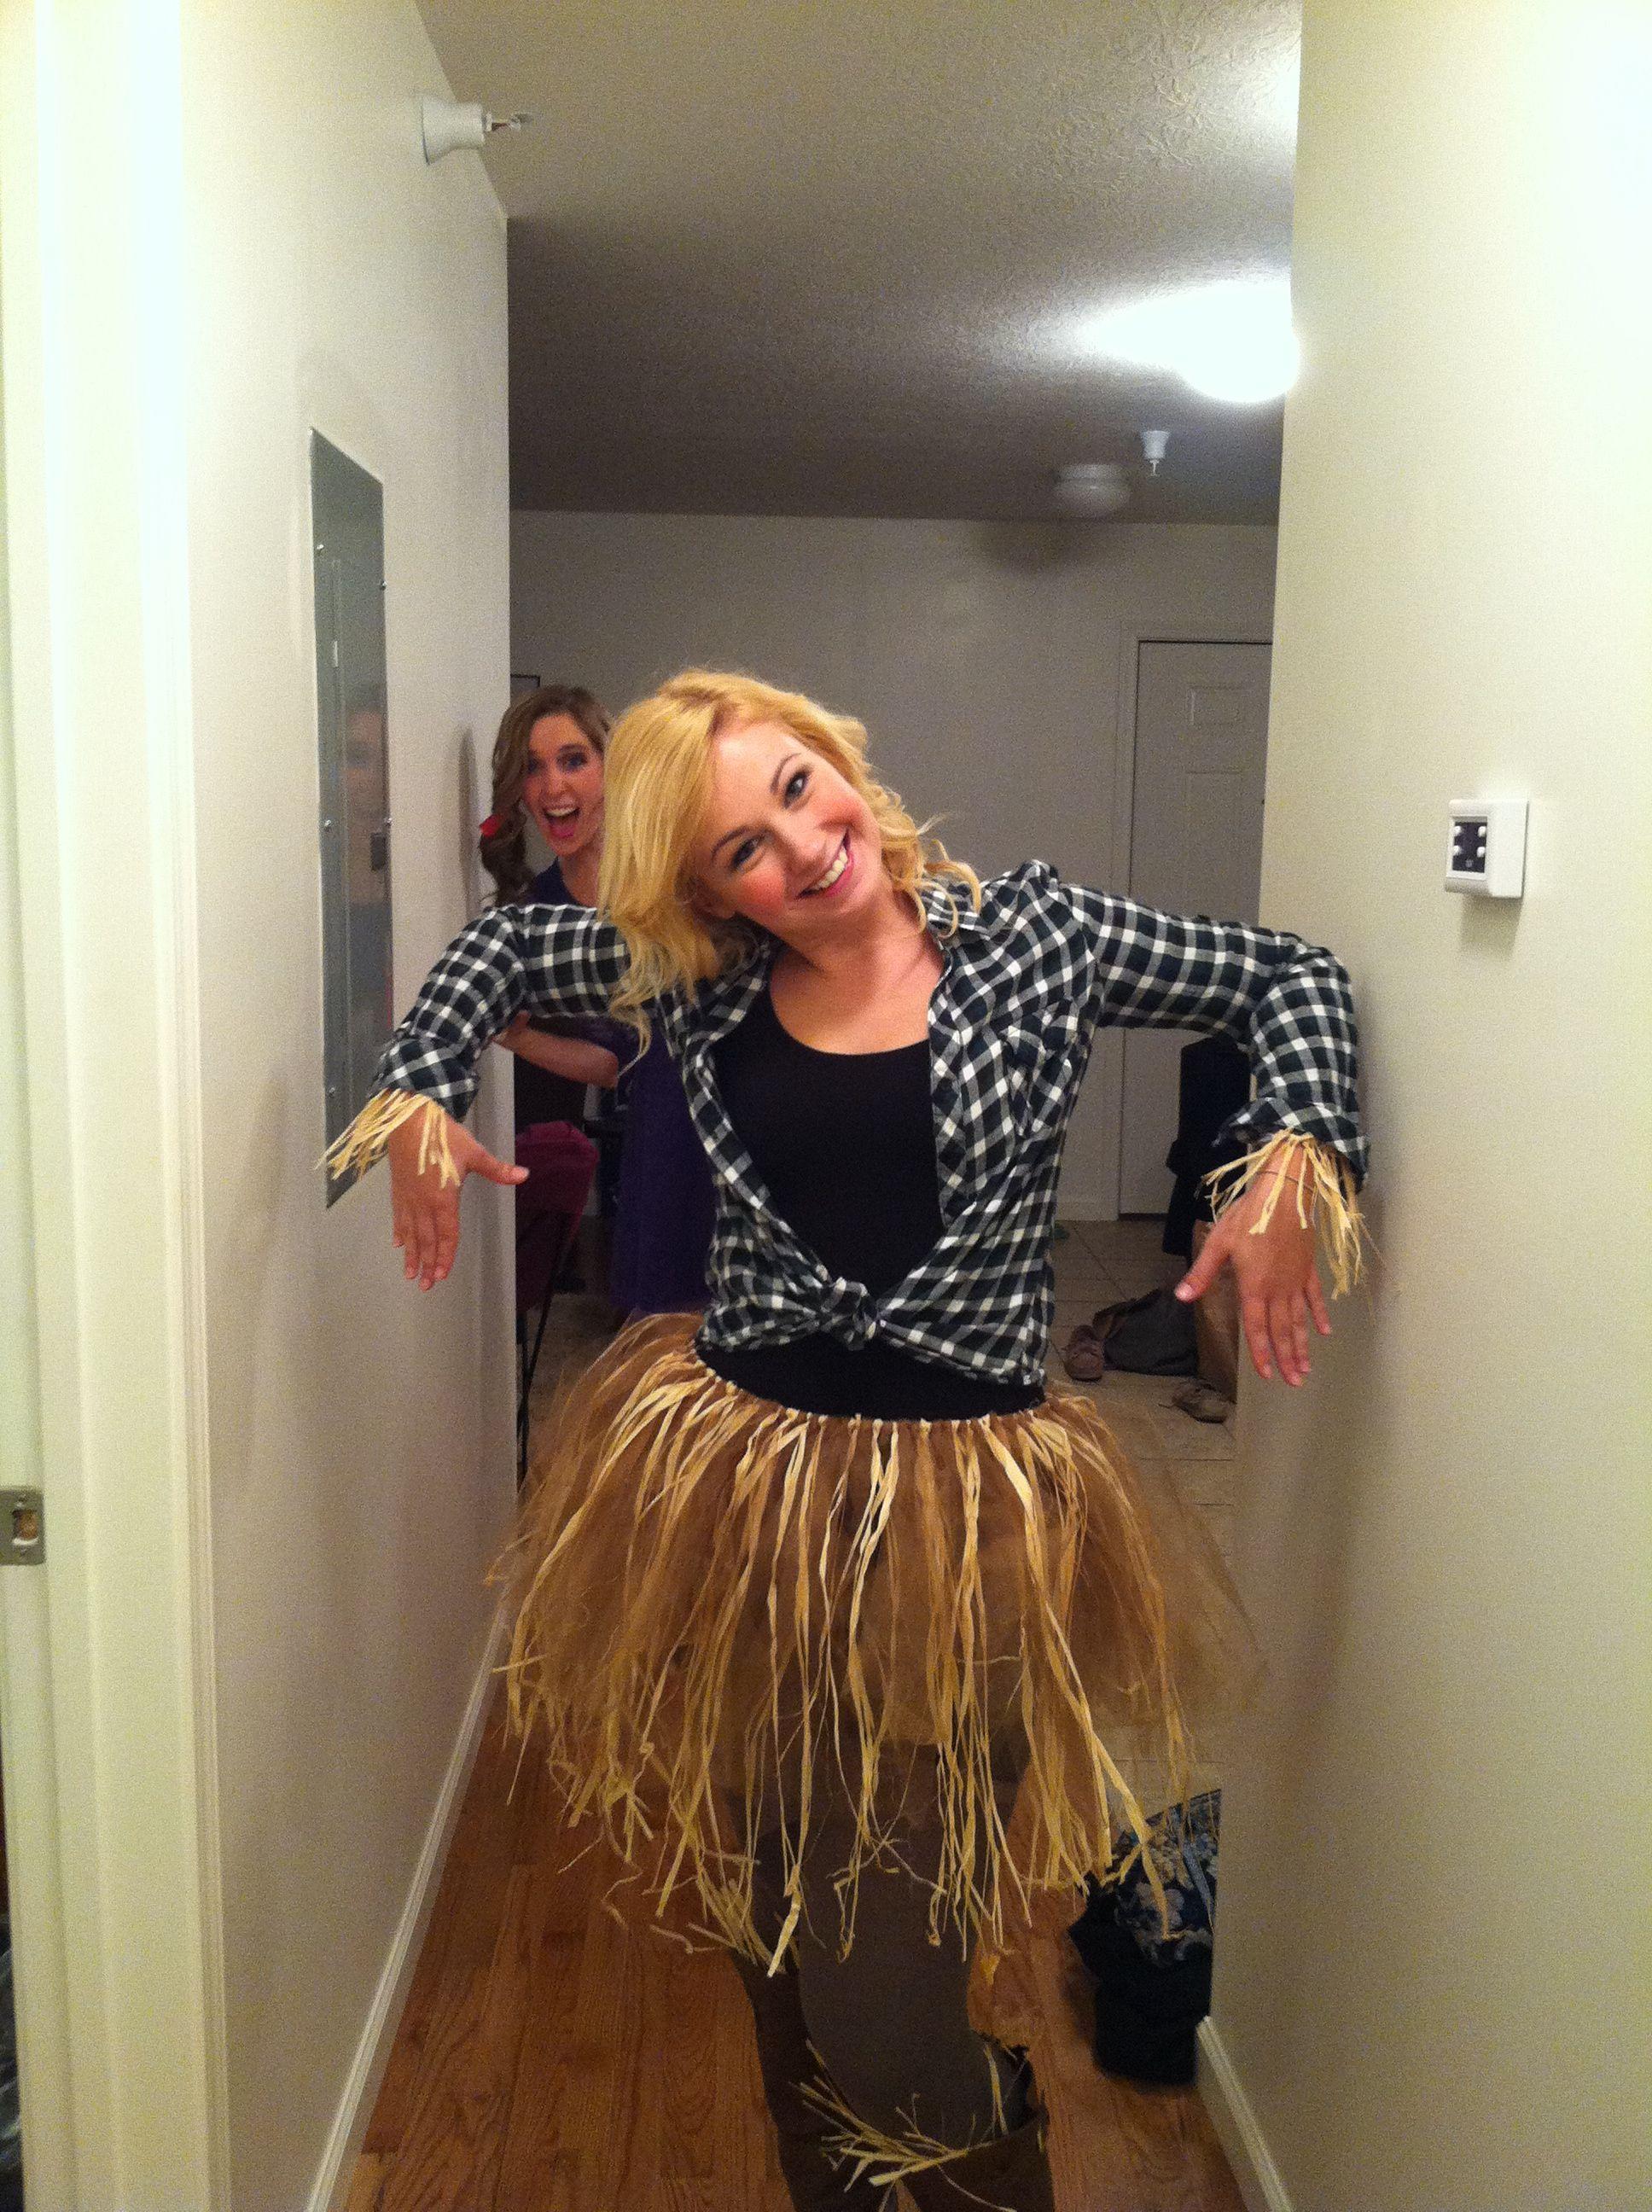 Scarecrow diy costume, homemade tutu! Craftiness